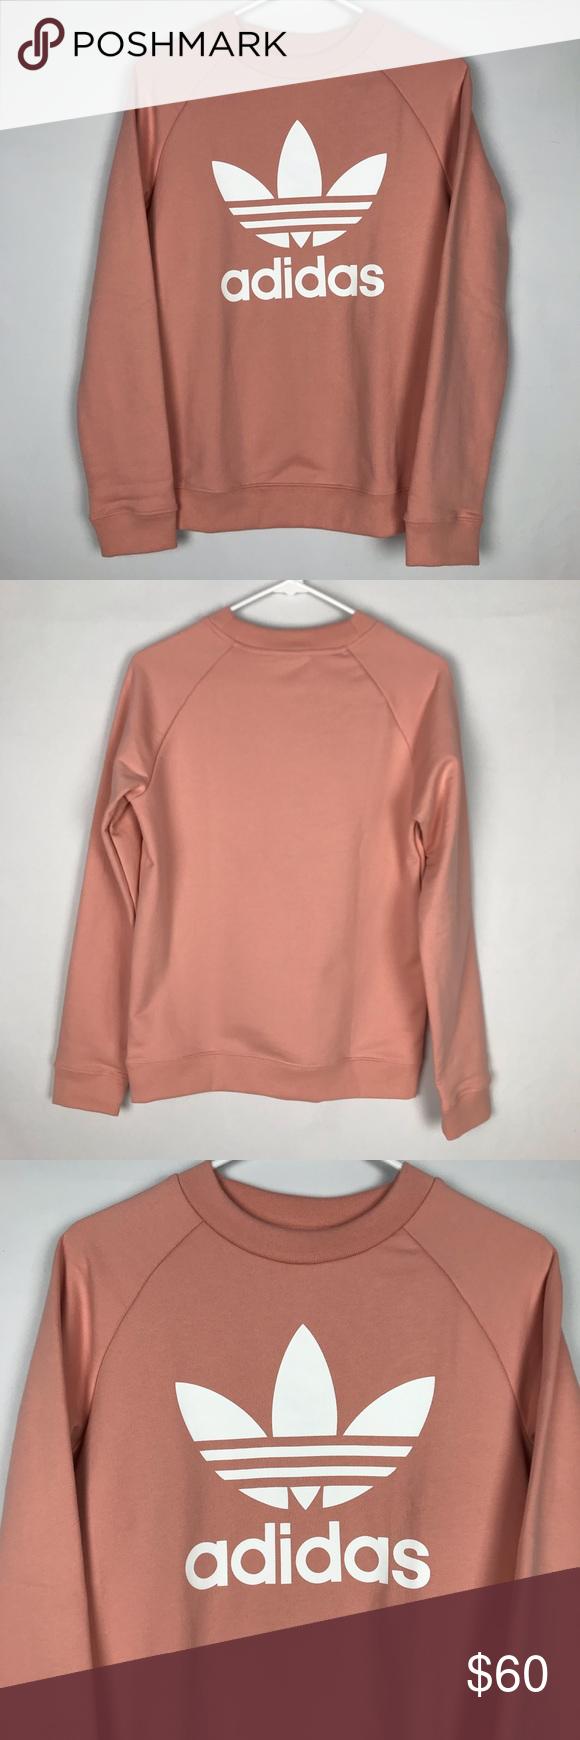 New Adidas Dusty Pink Crewneck Sweatshirt Pink Crewneck Sweatshirt Pink Crewneck Sweatshirts [ 1740 x 580 Pixel ]